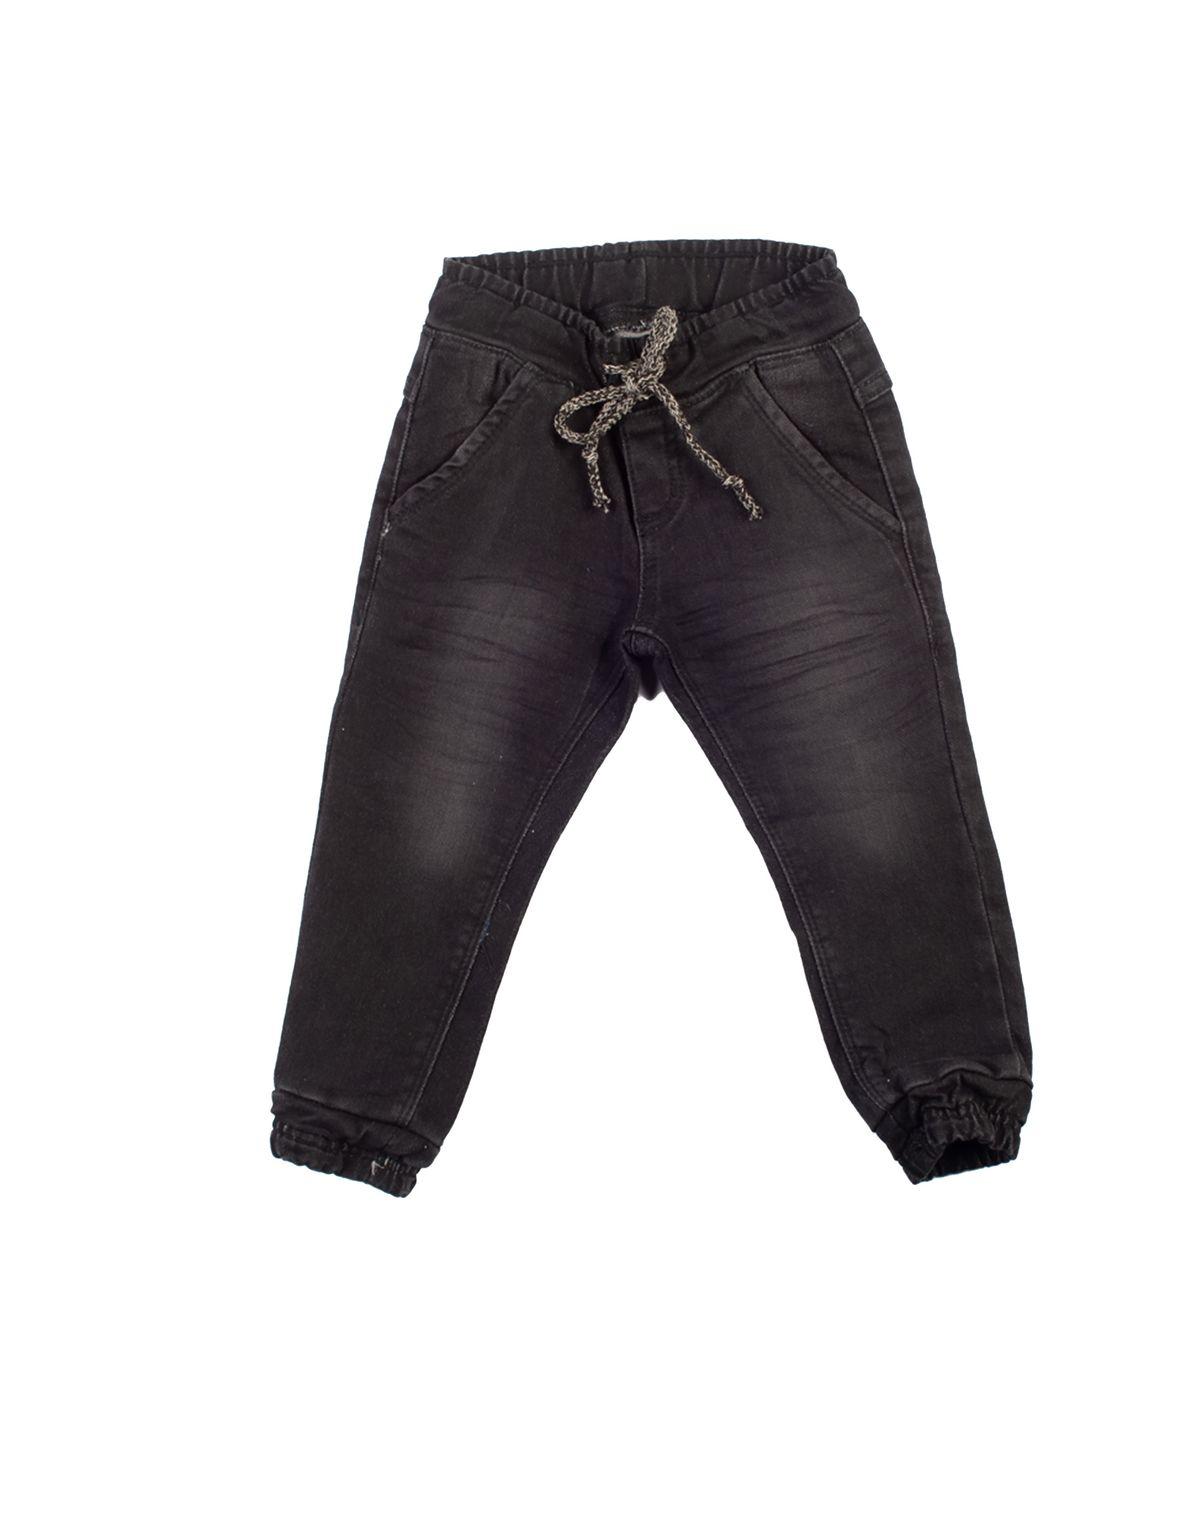 565391004-calca-moletom-jogger-bebe-menino-lavagem-jeans-black-black-01-3-b9c